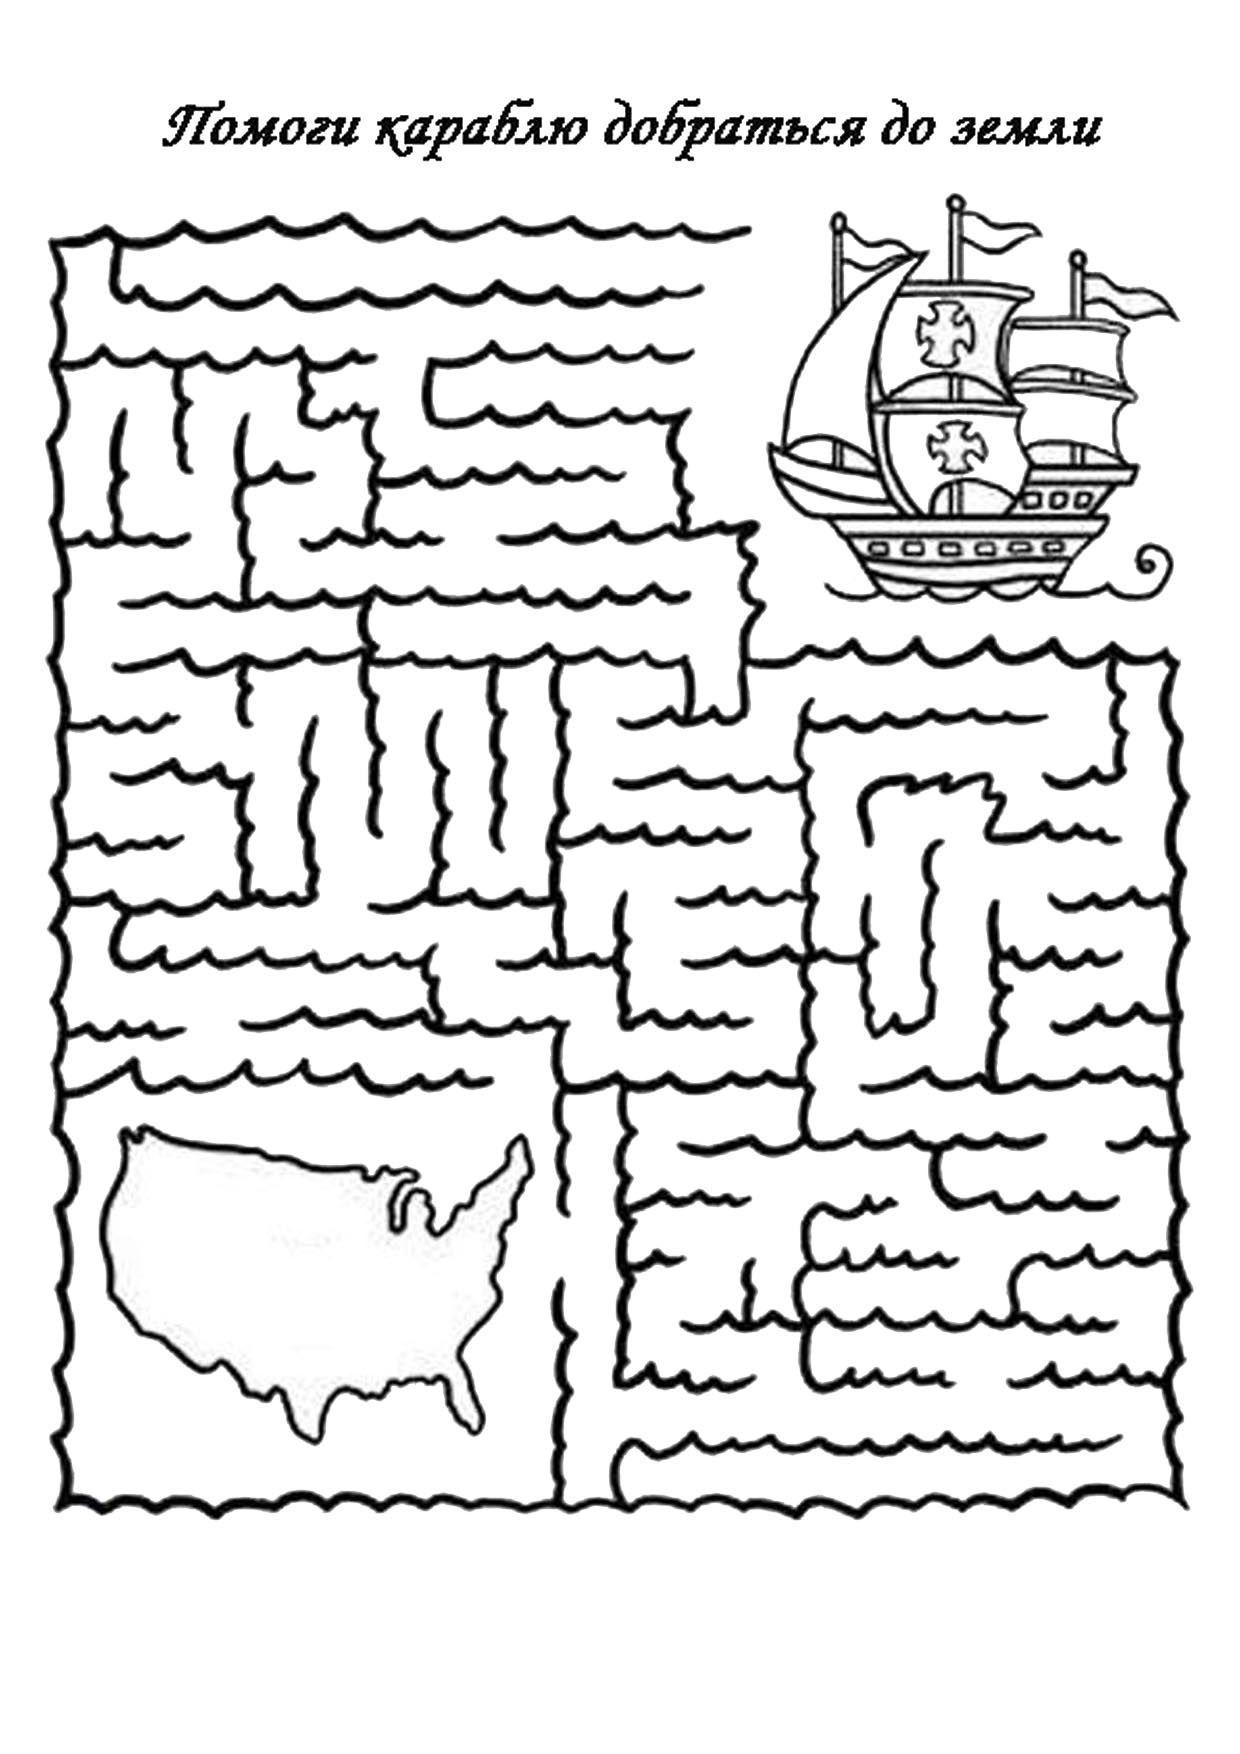 worksheet Columbus Day Worksheets httpss3 eu central 1 amazonaws comimg sovenok co uktransport columbus day printables maze worksheet cc cycle 3 week history notebooking page